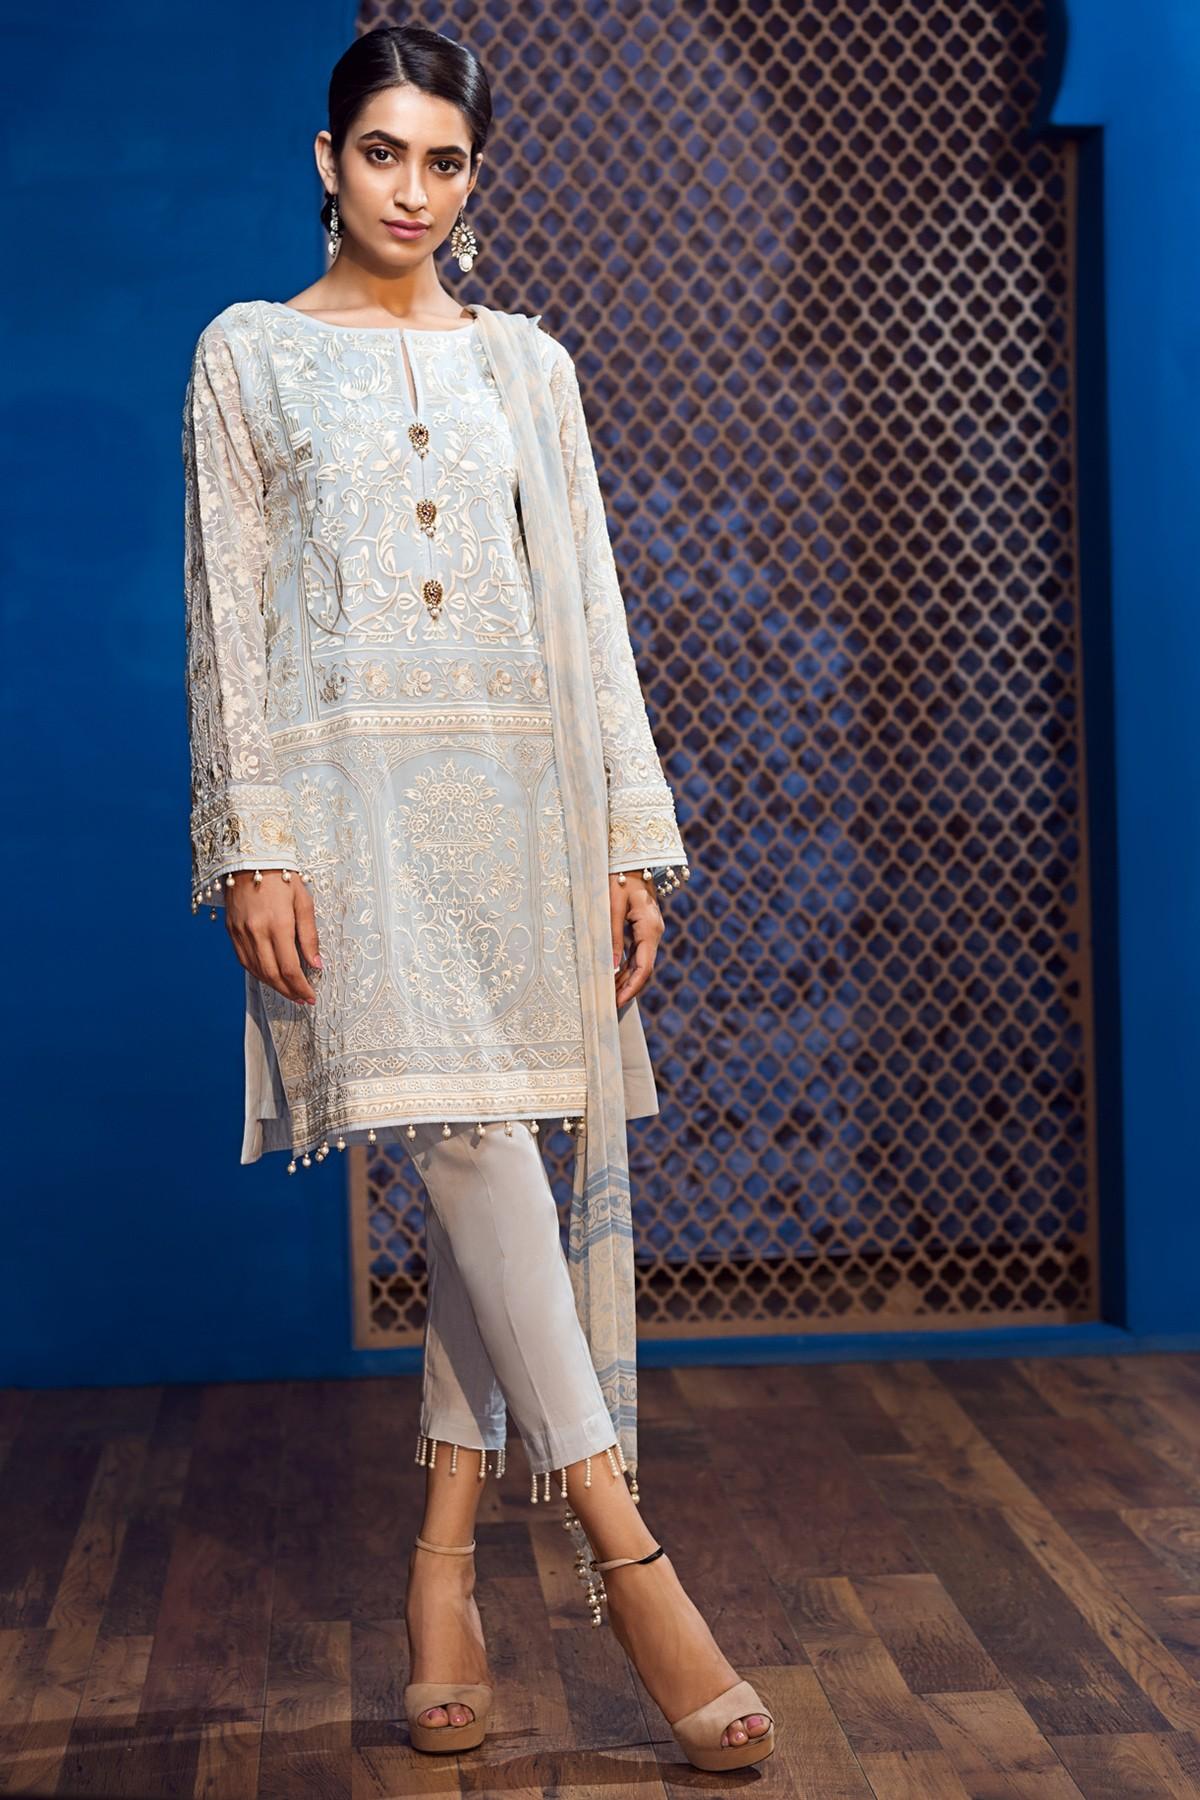 Dress for Eid by Khaadi